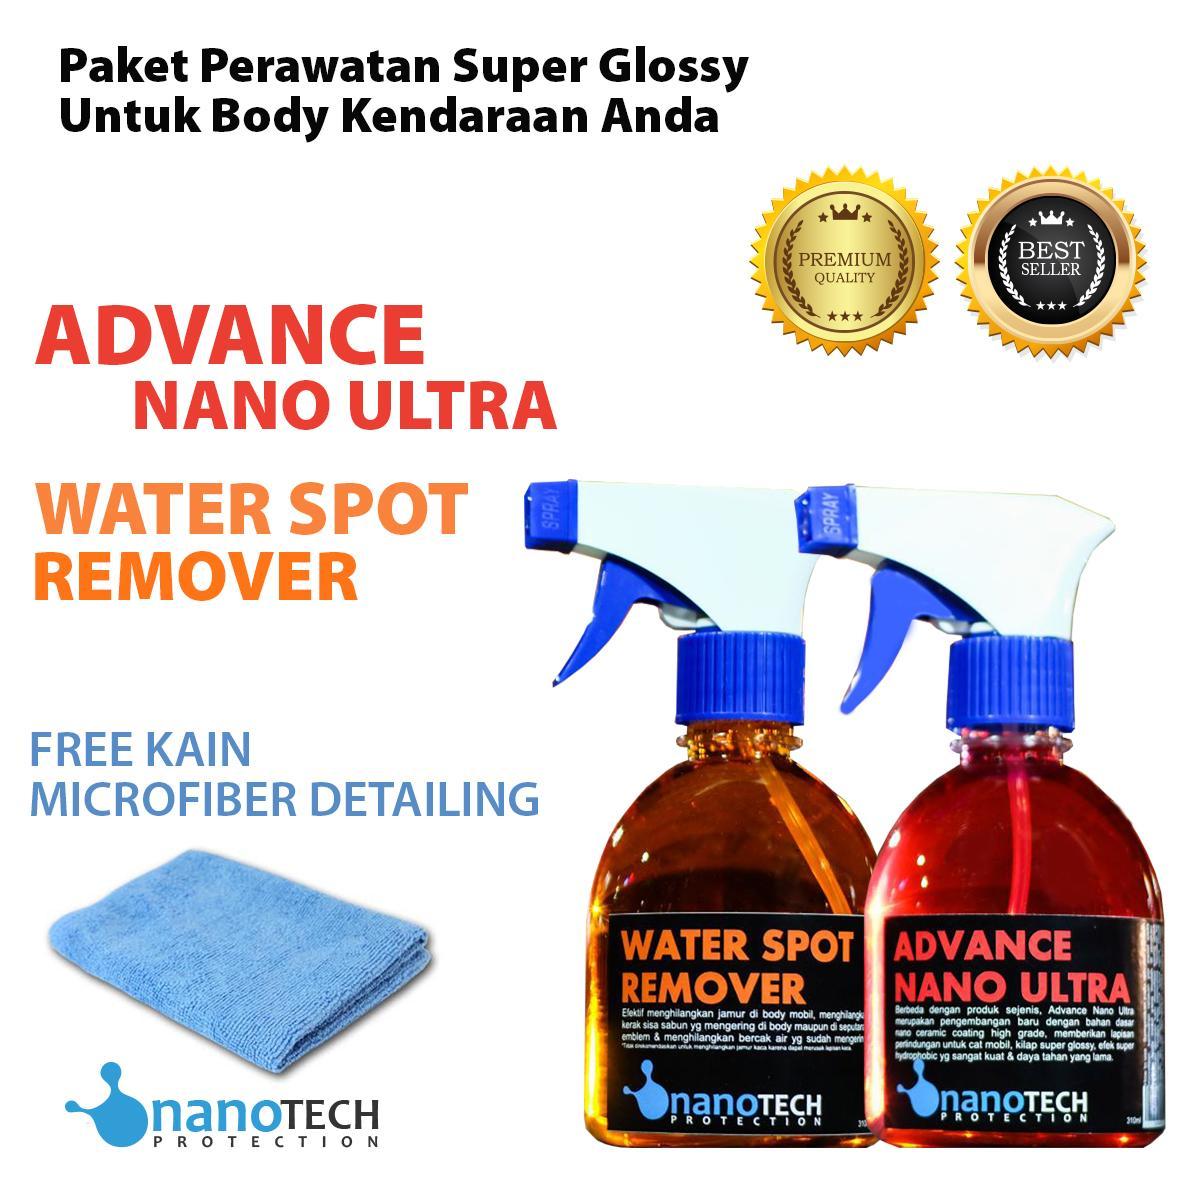 Paket Perawatan Super Glossy Untuk Body Kendaraan Anda - Nanotech Protection By Nanotech Tangerang.